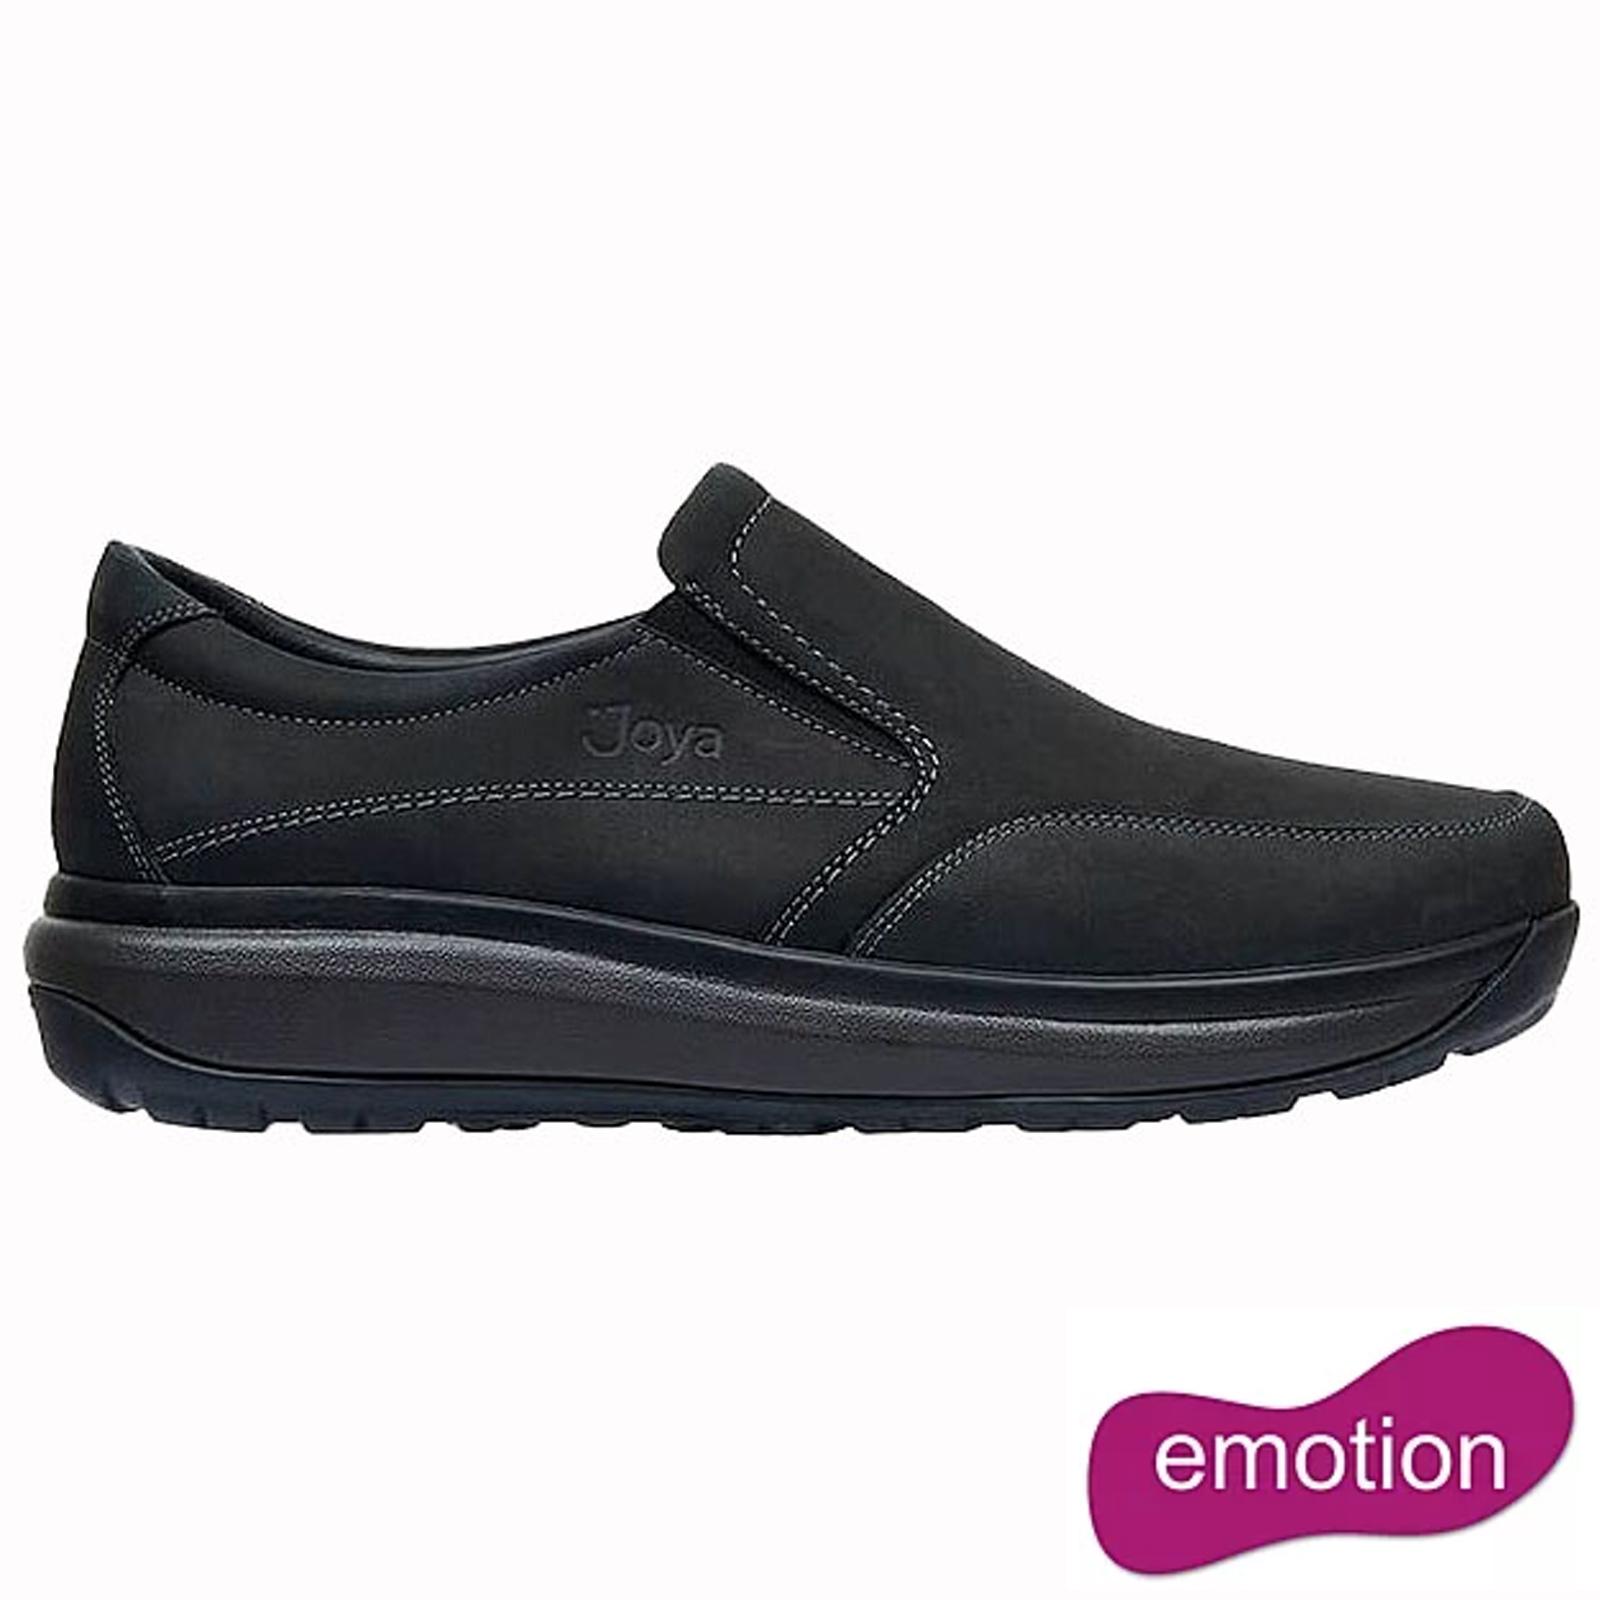 Joya Mens Traveller II Shoes - Black